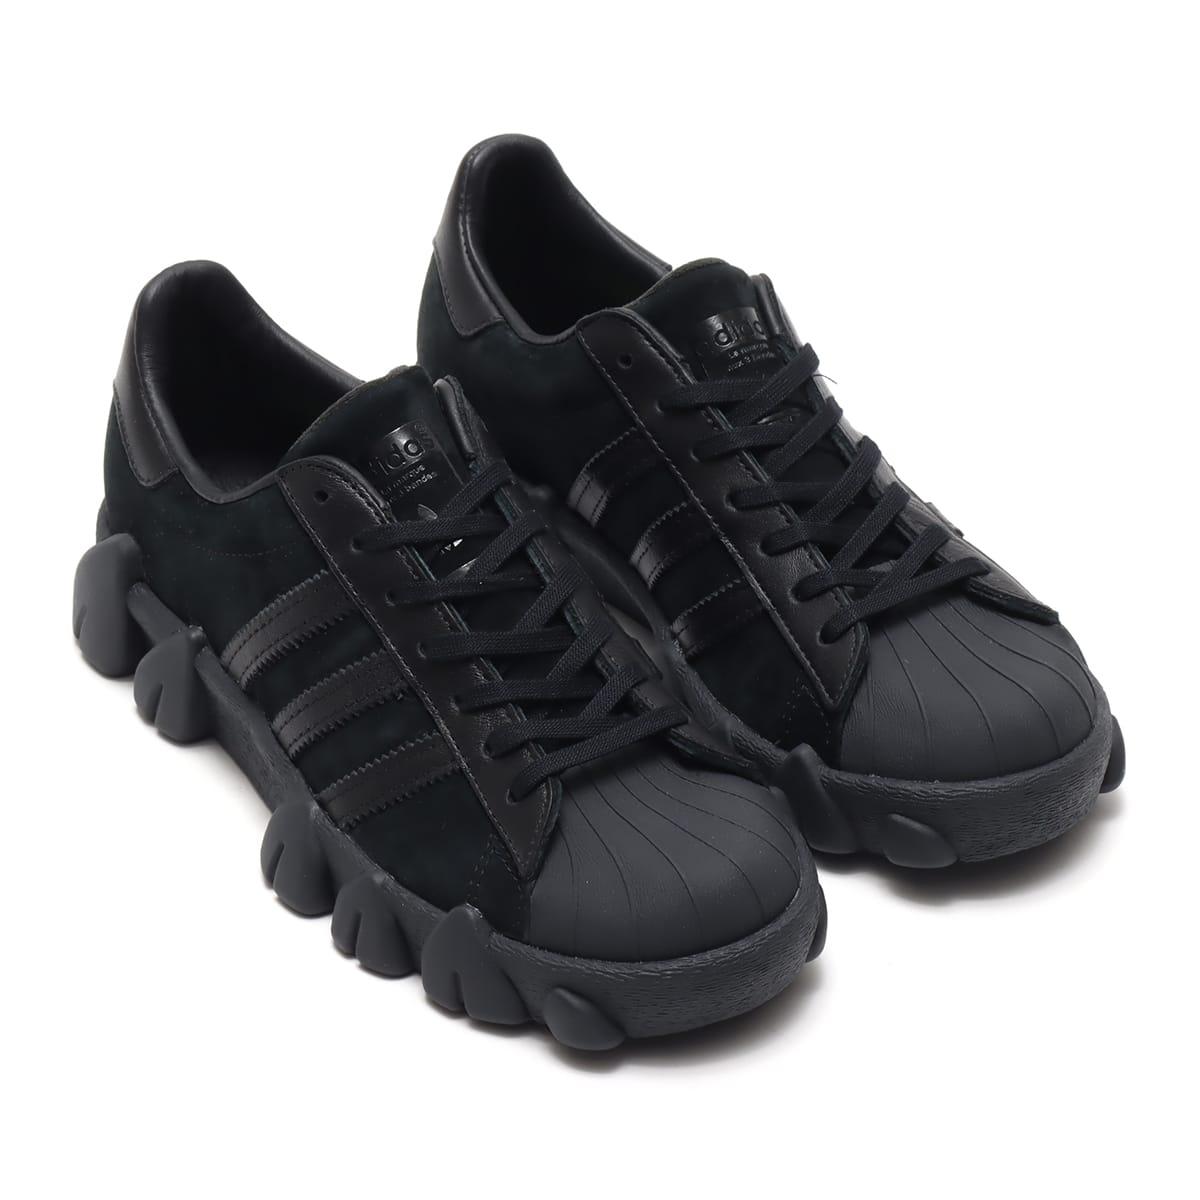 adidas Consortium SUPERSTAR80S AC CORE BLACK/CORE BLACK/FTWR WHITE 20FW-S_photo_large